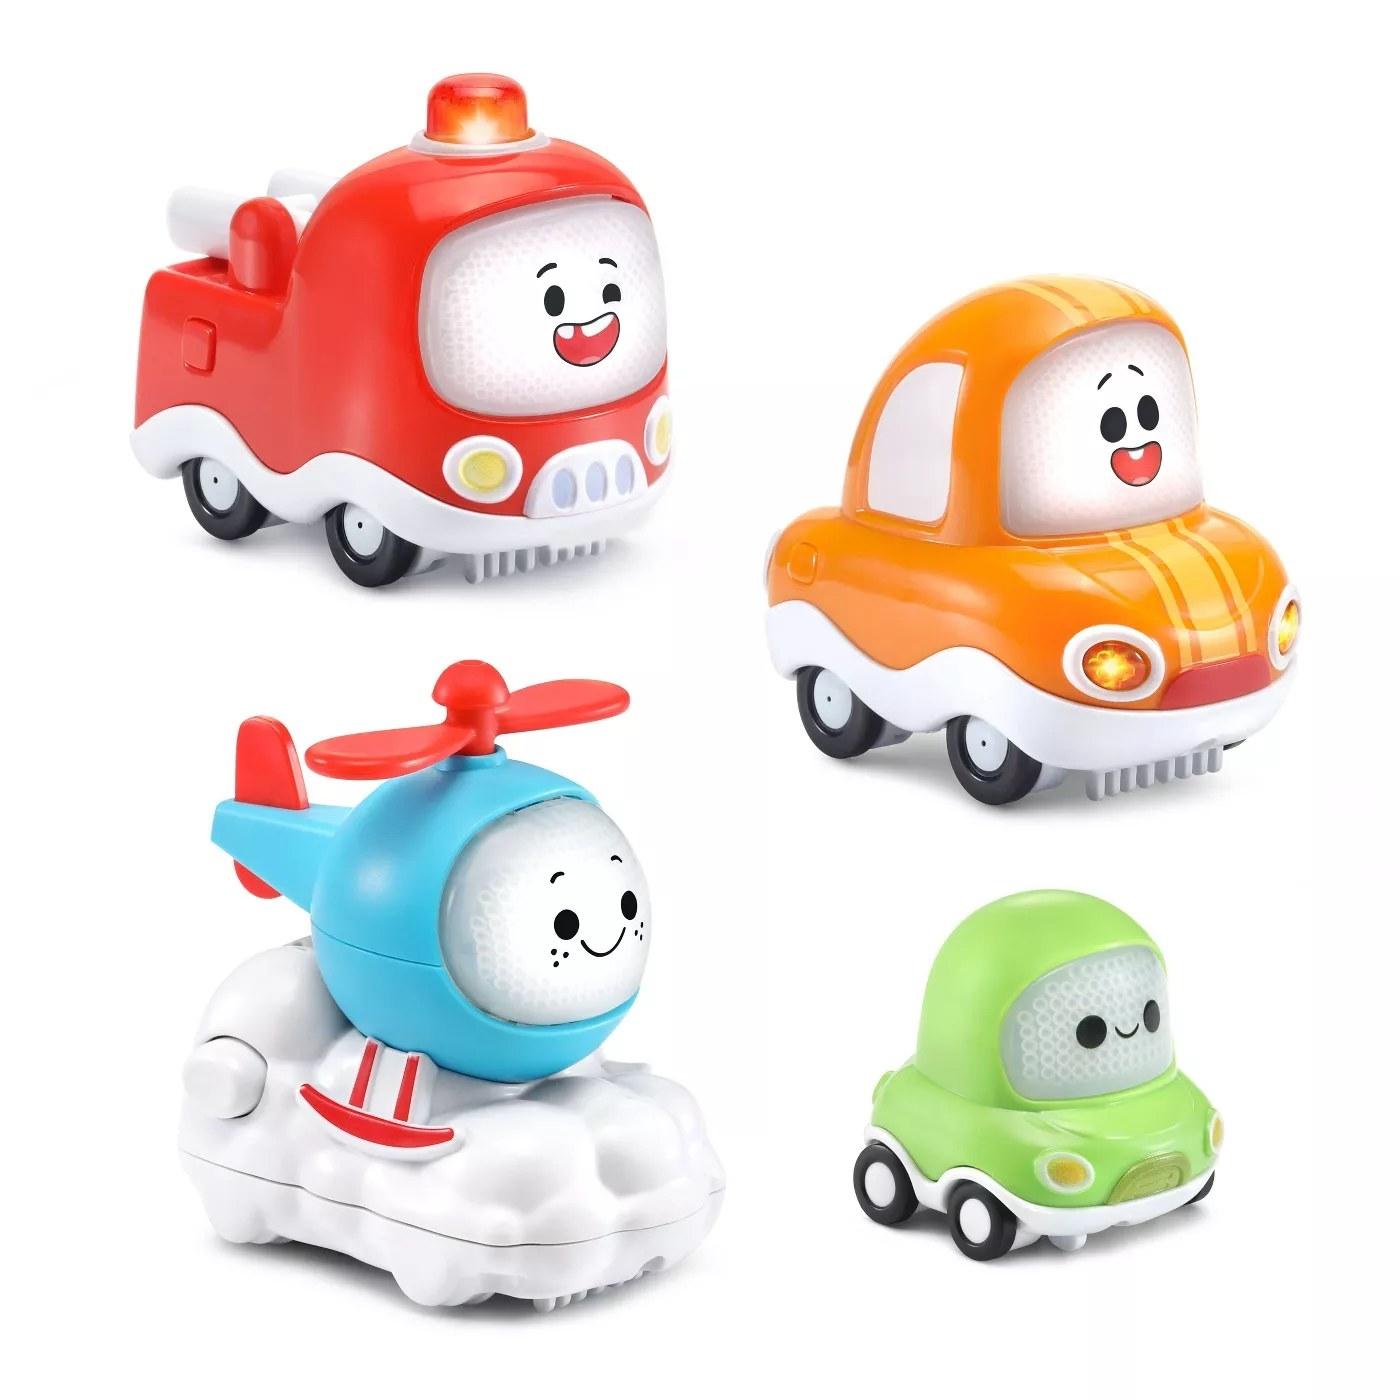 the four-piece toy set